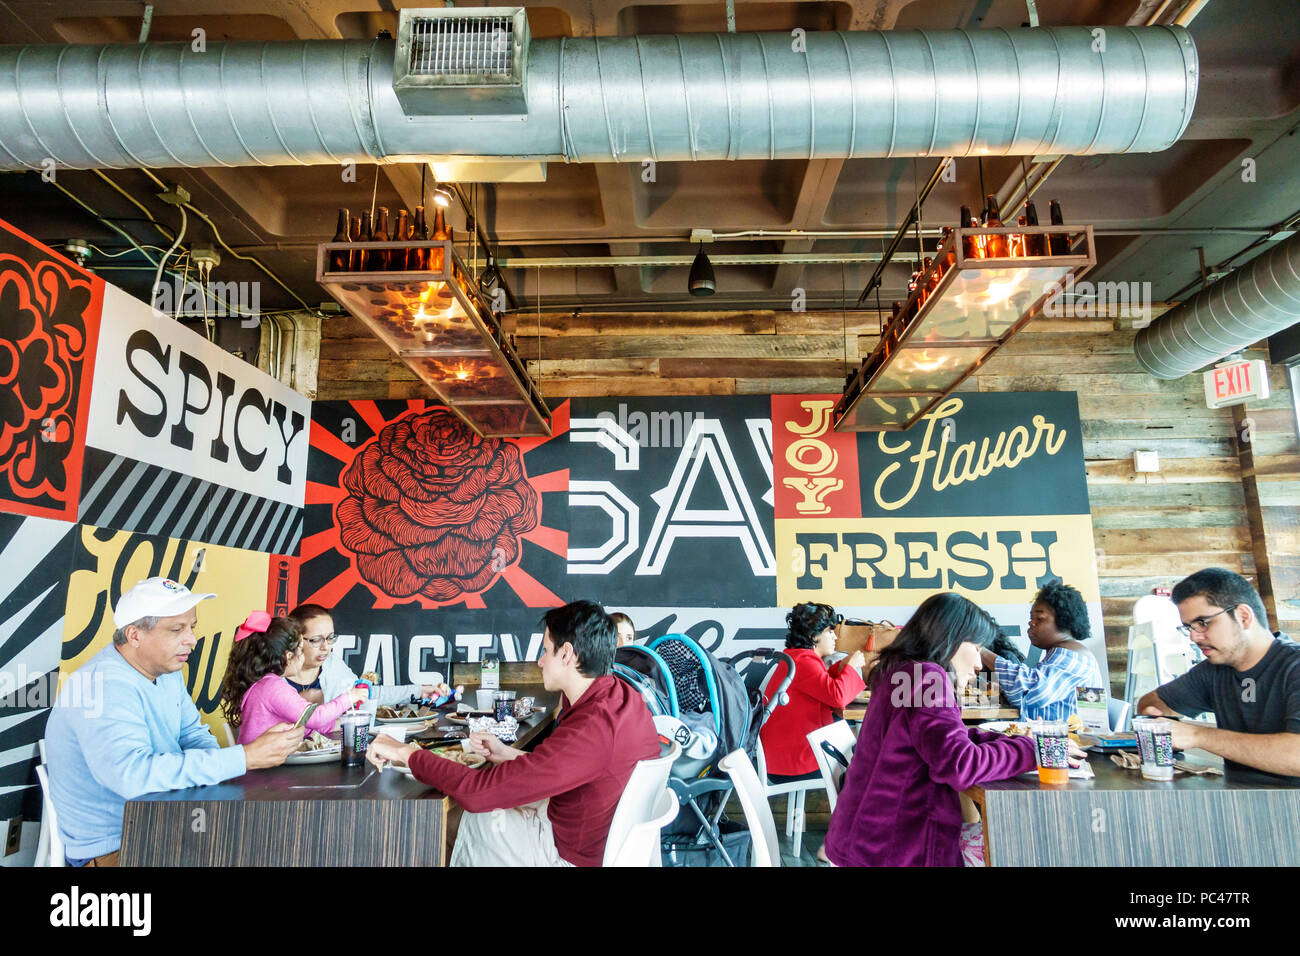 Miami Florida Salsa Fiesta Mexican Restaurant Interior Industrial